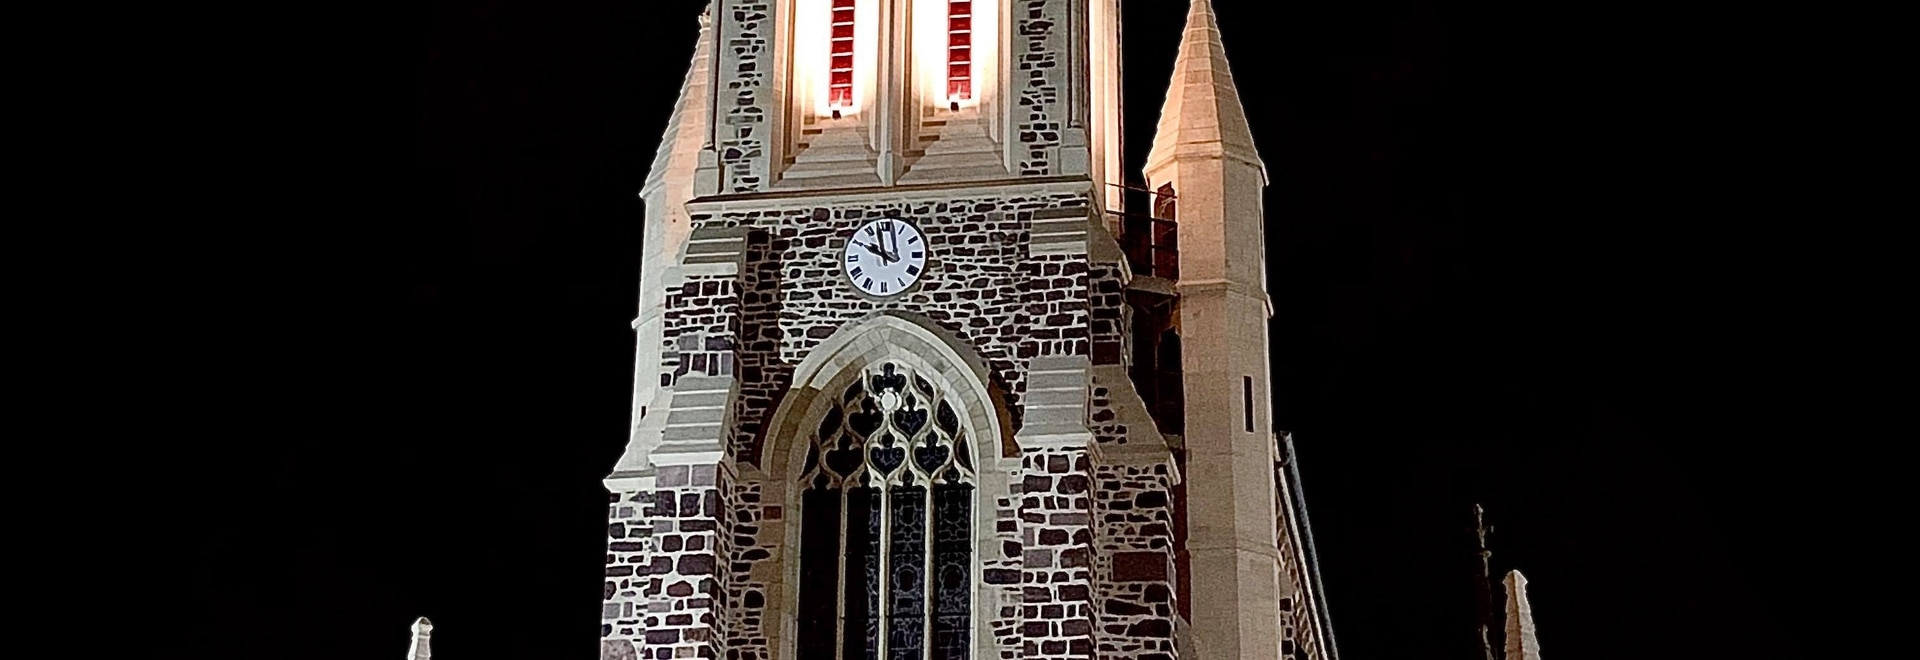 Project – Church of Bédée, France